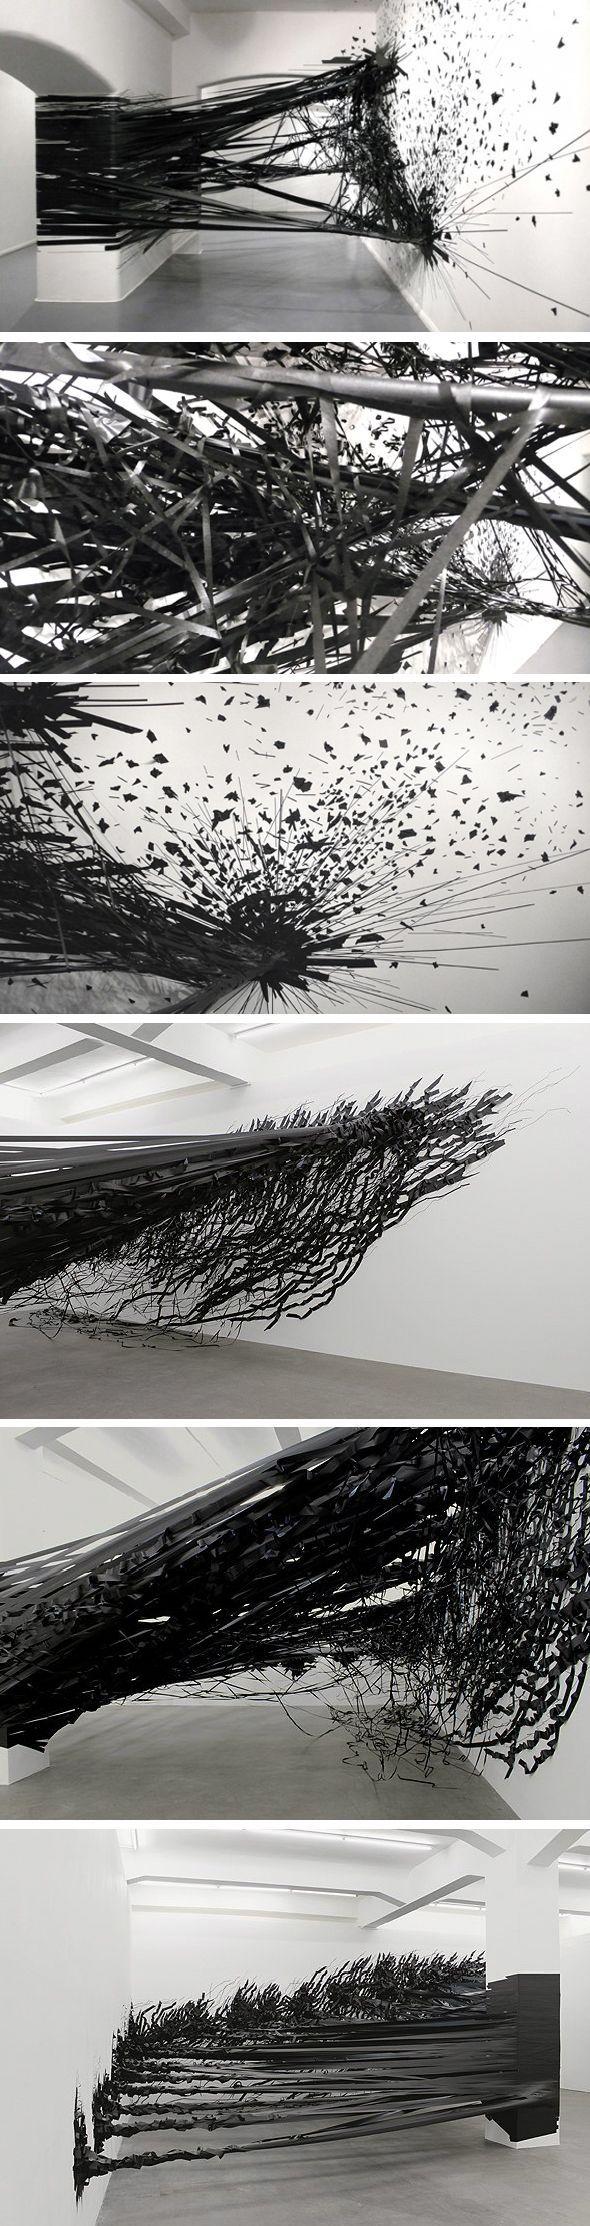 "Art   アート   искусство   Arte   Kunst   Paintings   Installations   ""Aerial"" tape installation by Monika Grzymala"